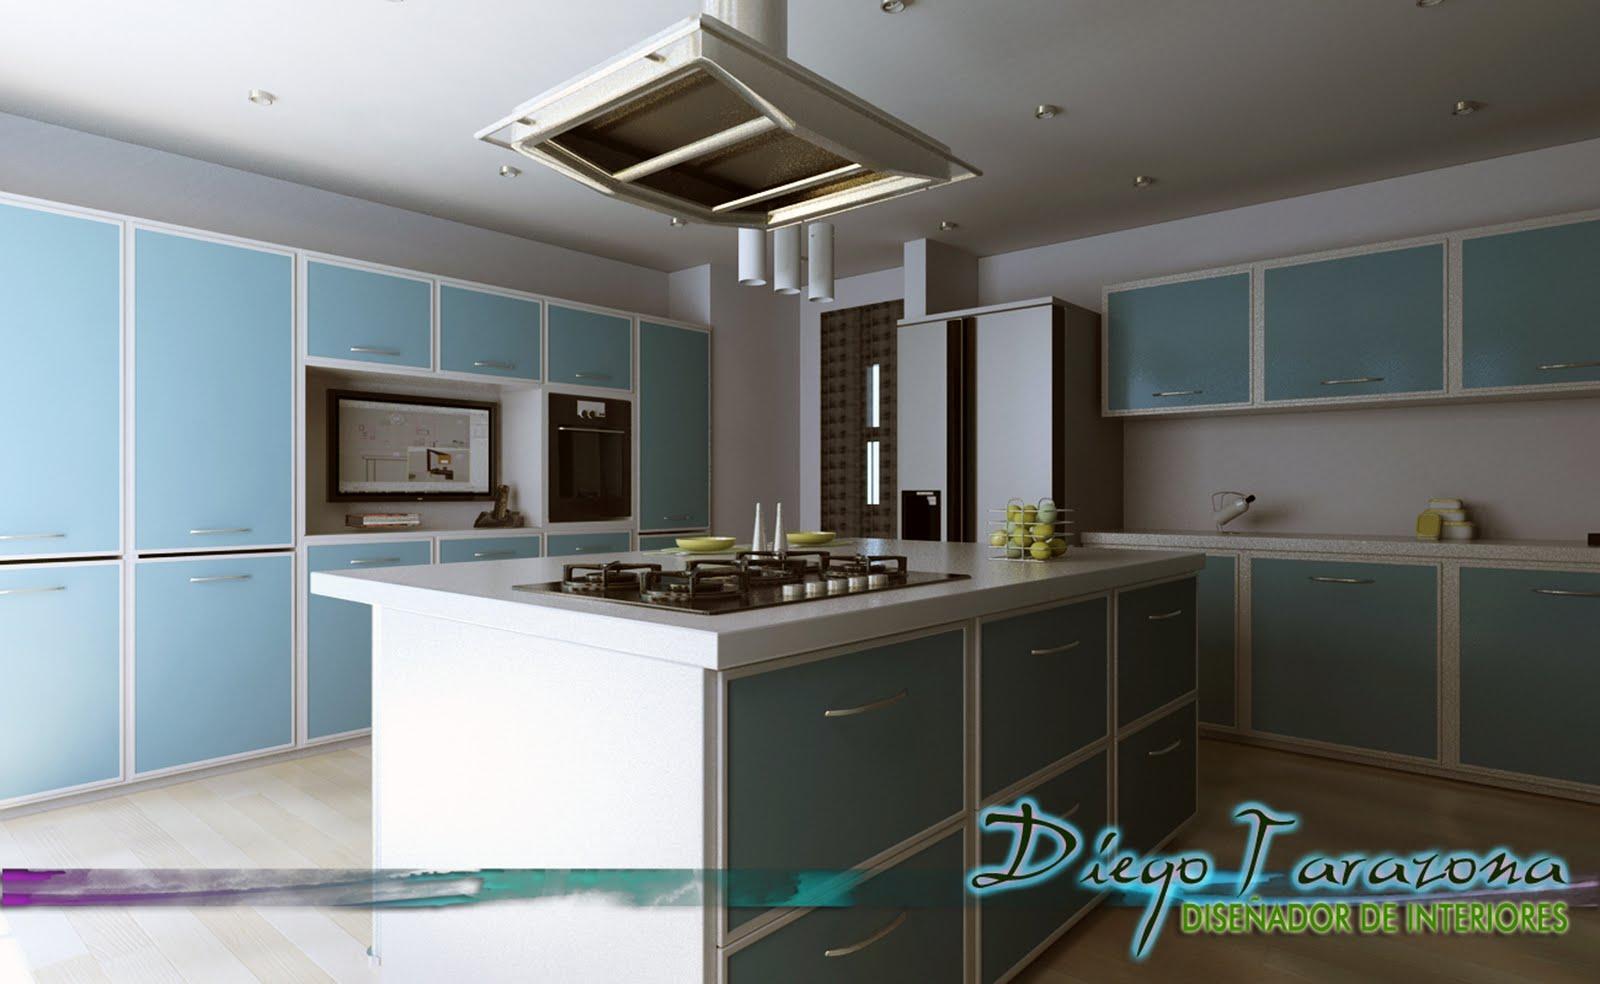 Portafolio diego tarazona dise ador de interiores cocina - Disenador de cocinas ...